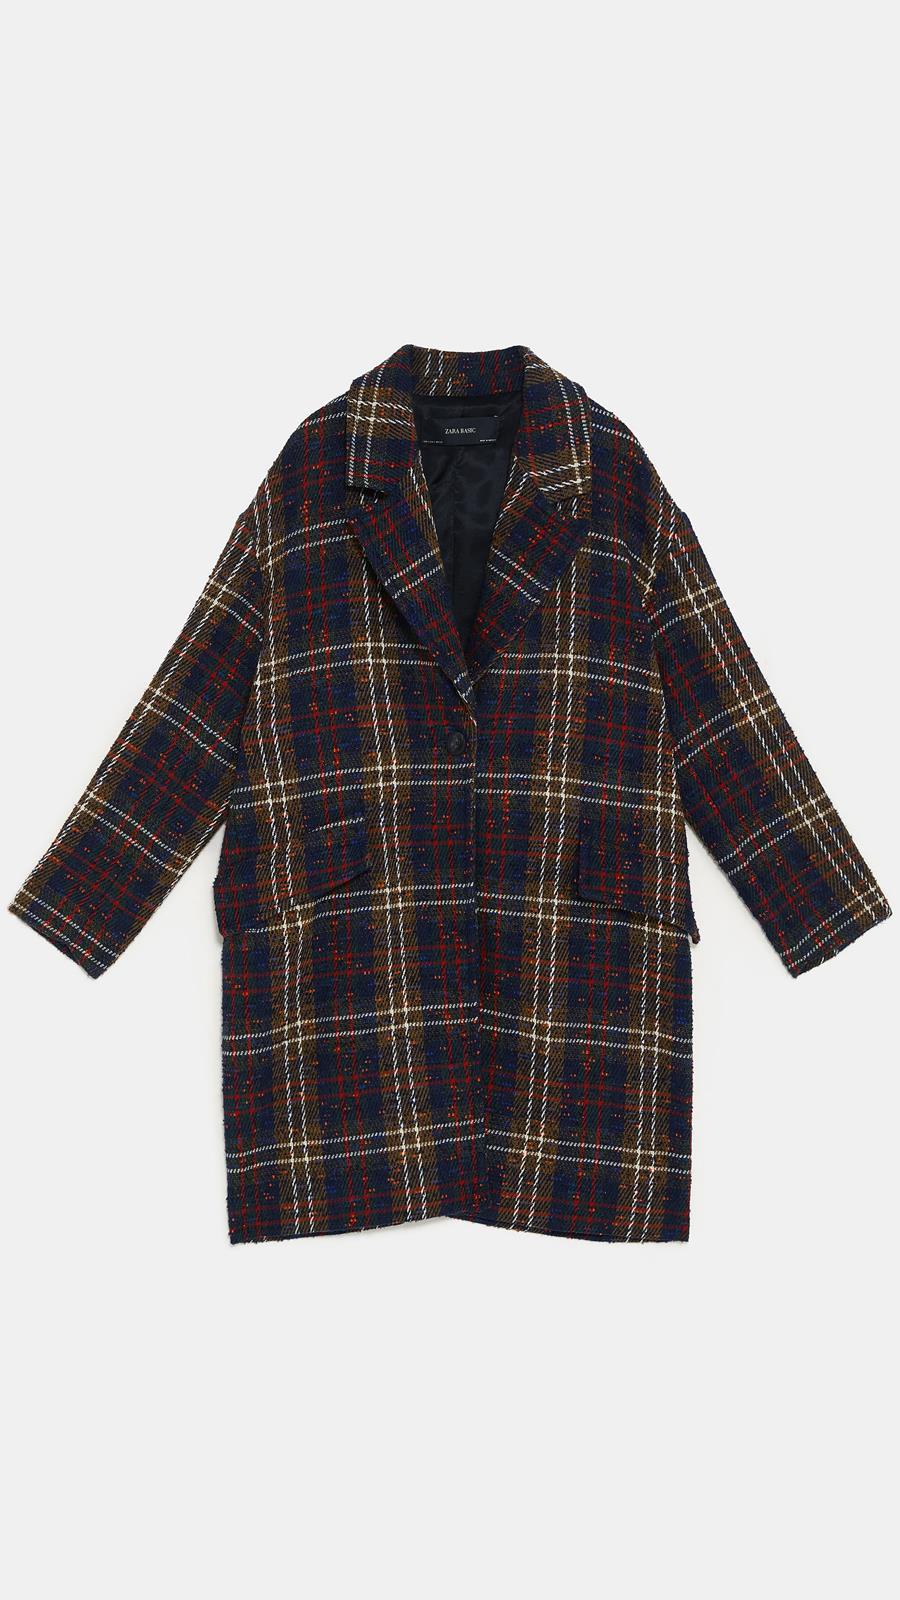 Abrigo de cuadros multicolor de Zara Con solapa y manga larga (79 723ad1609e36